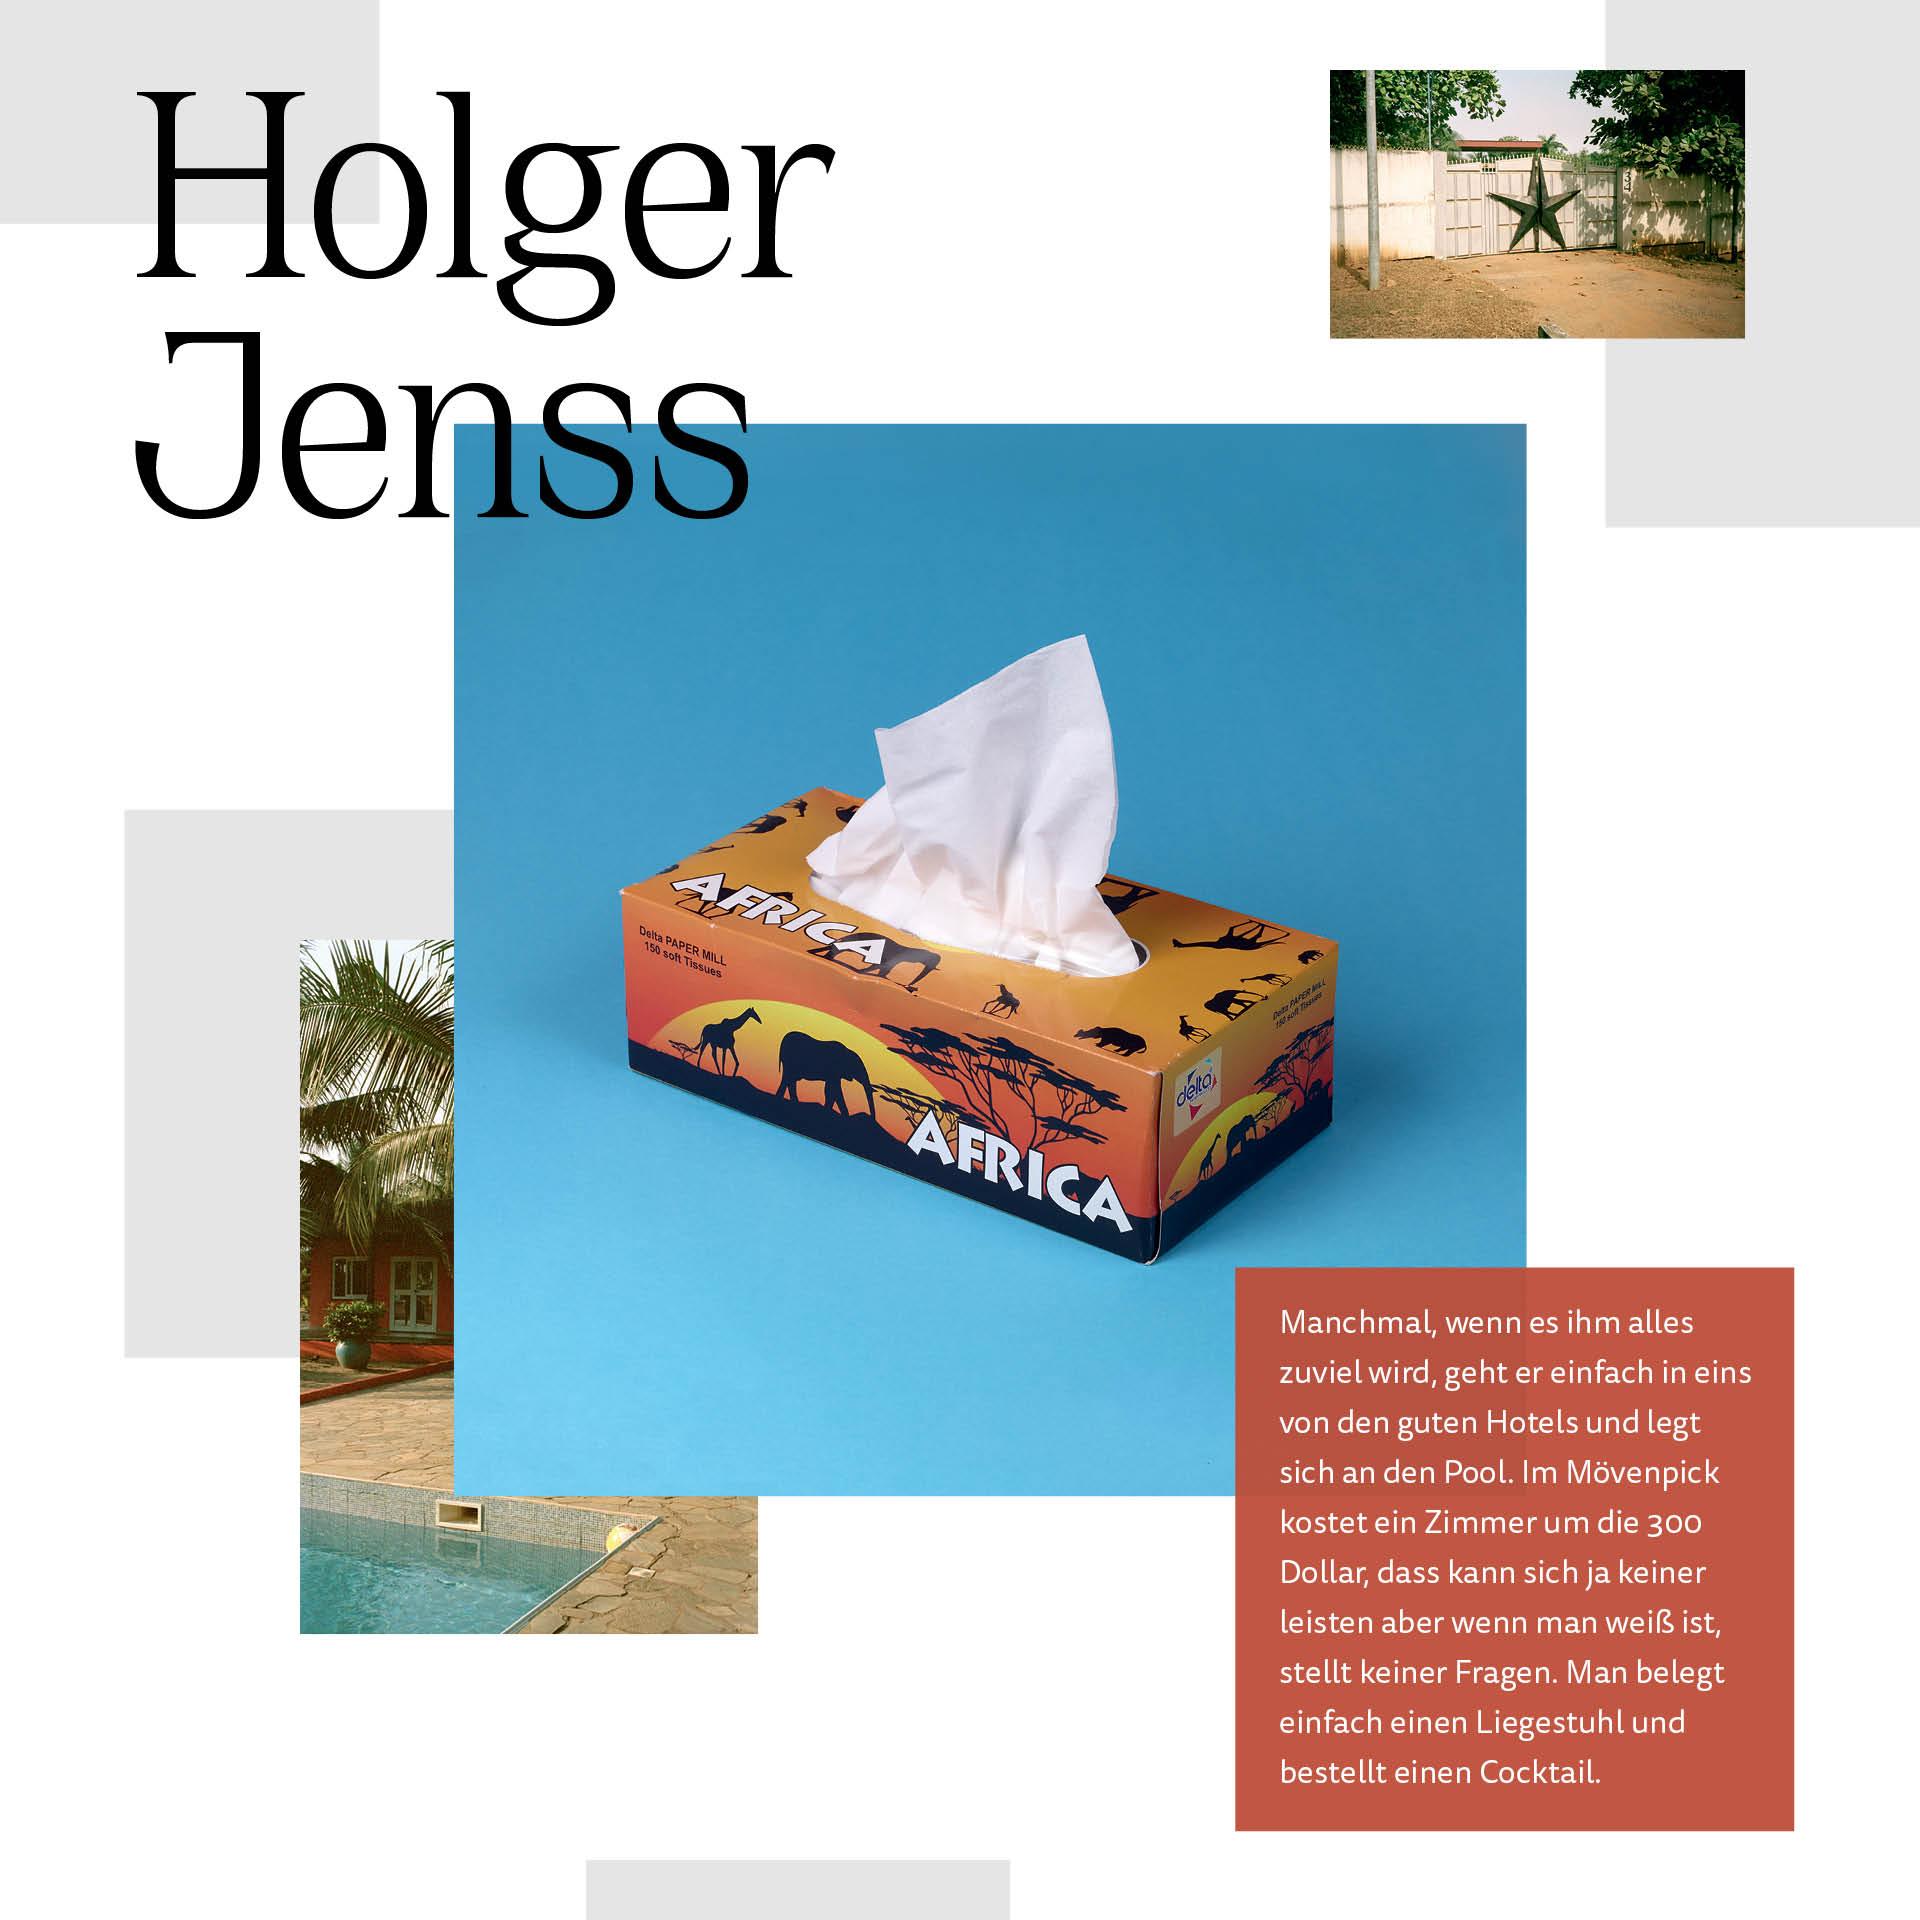 Beyond Artist Holger Jenss